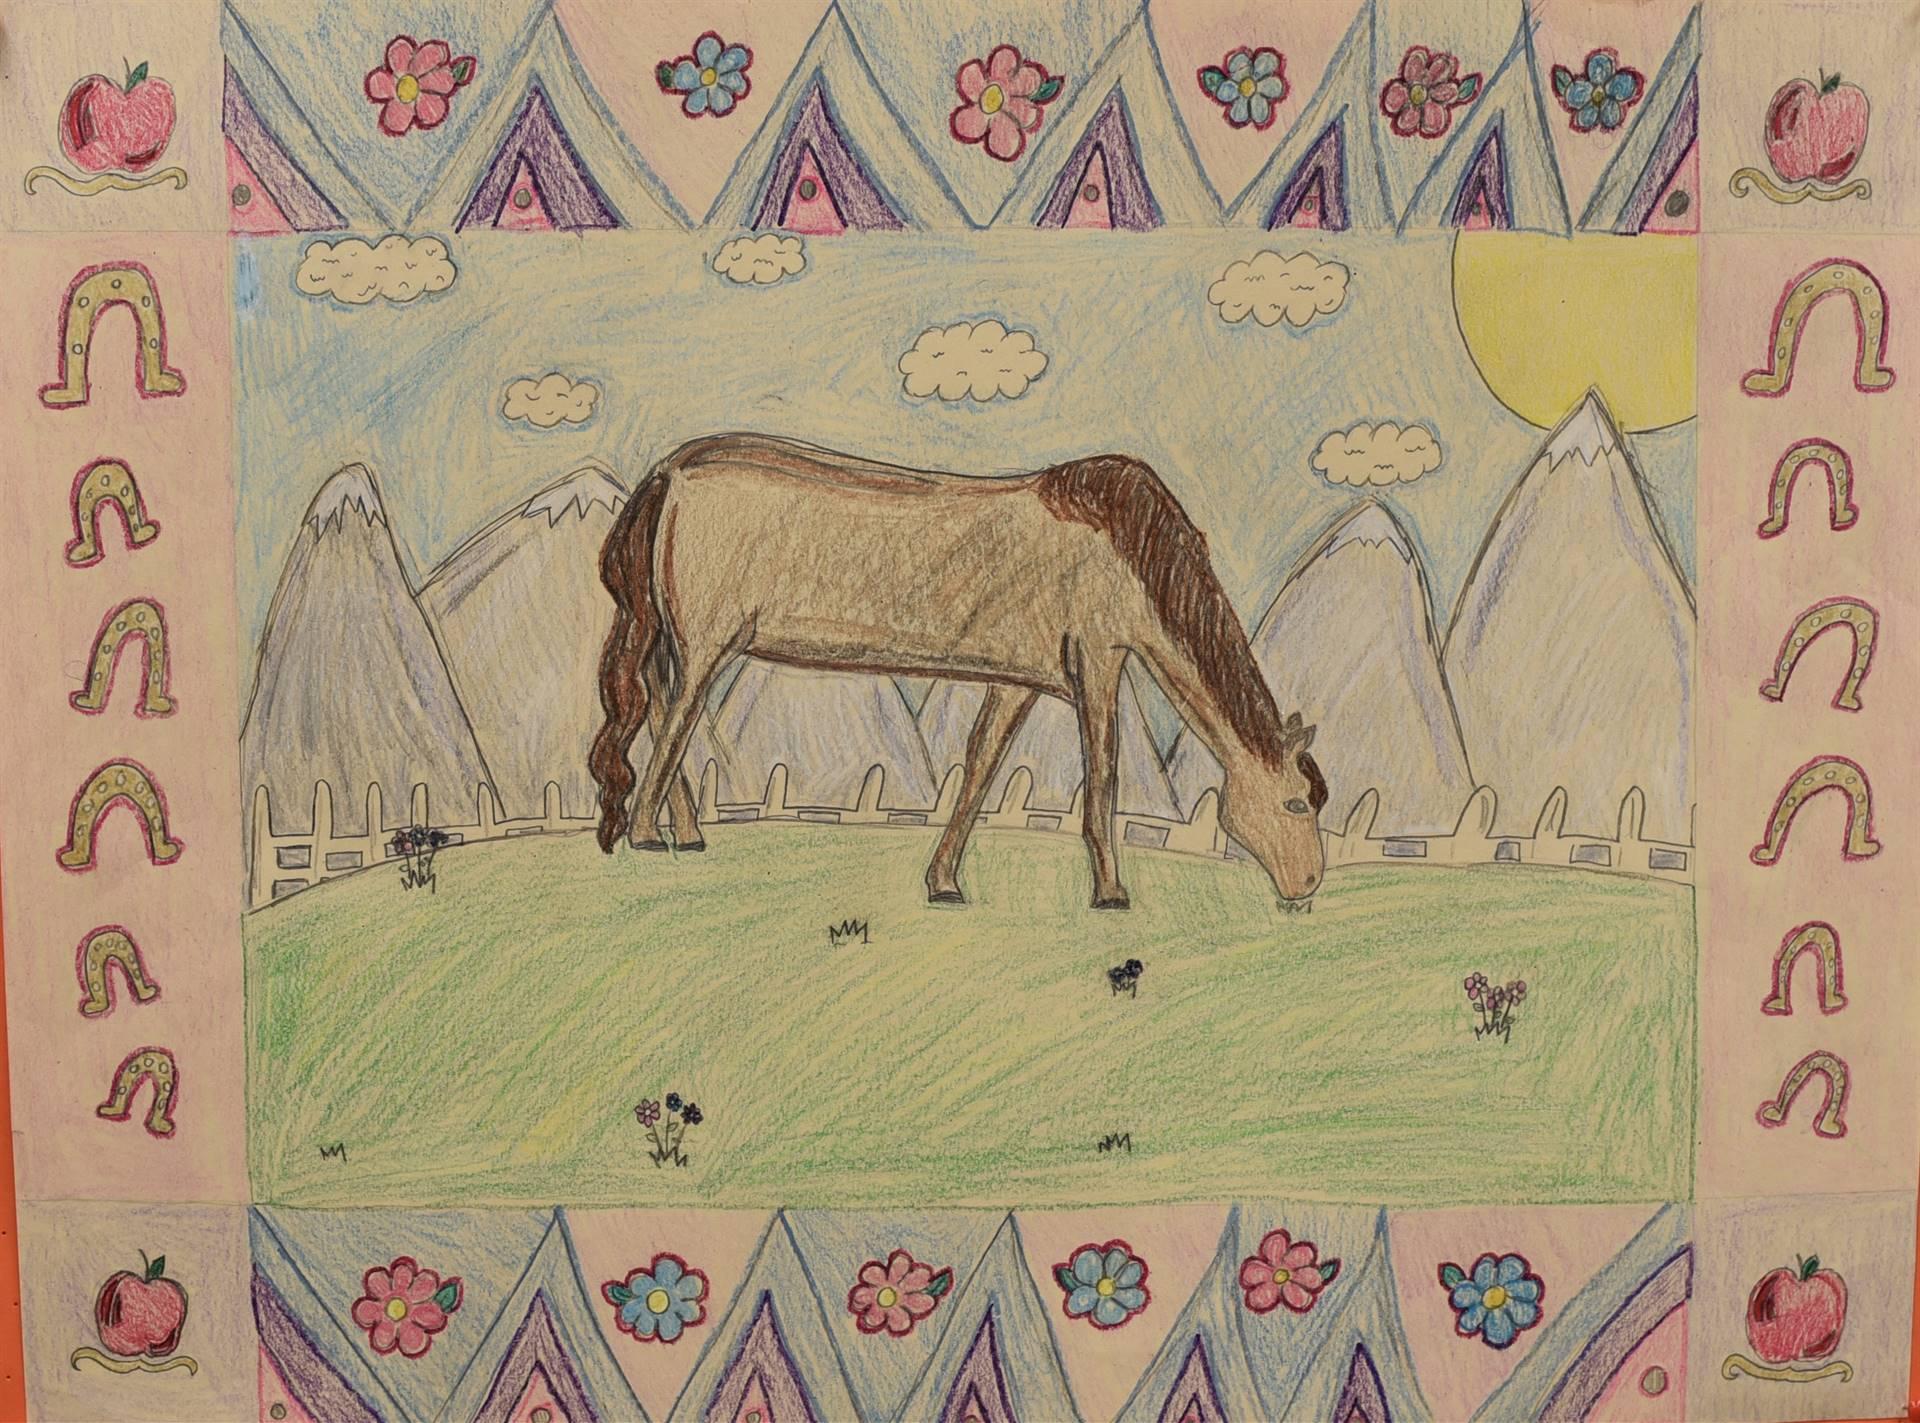 Brecksville-Broadview Hts. Middle School Art Projects 102